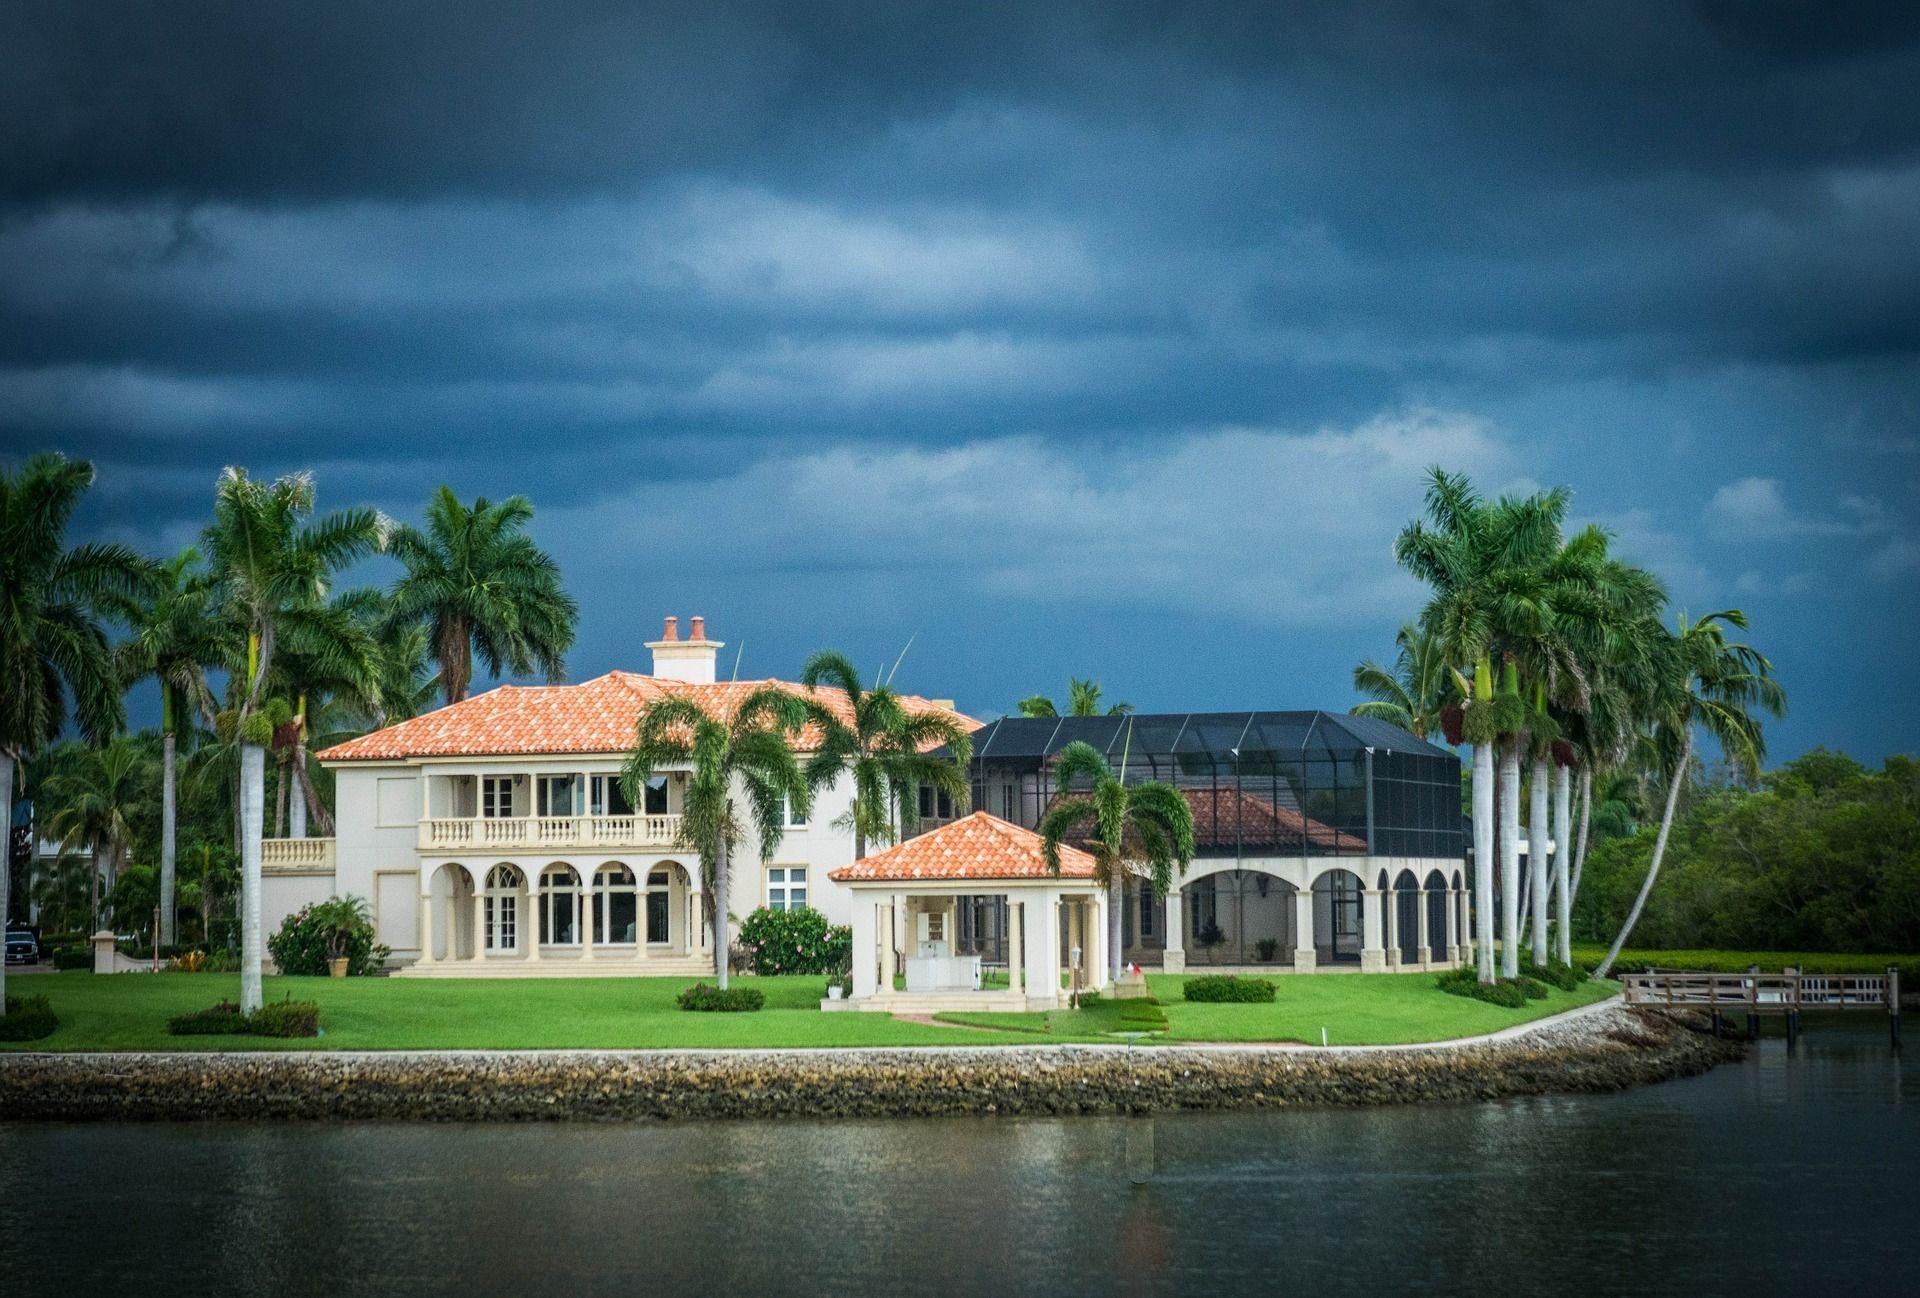 MarALago Has A Flood Insurance Policy Through The